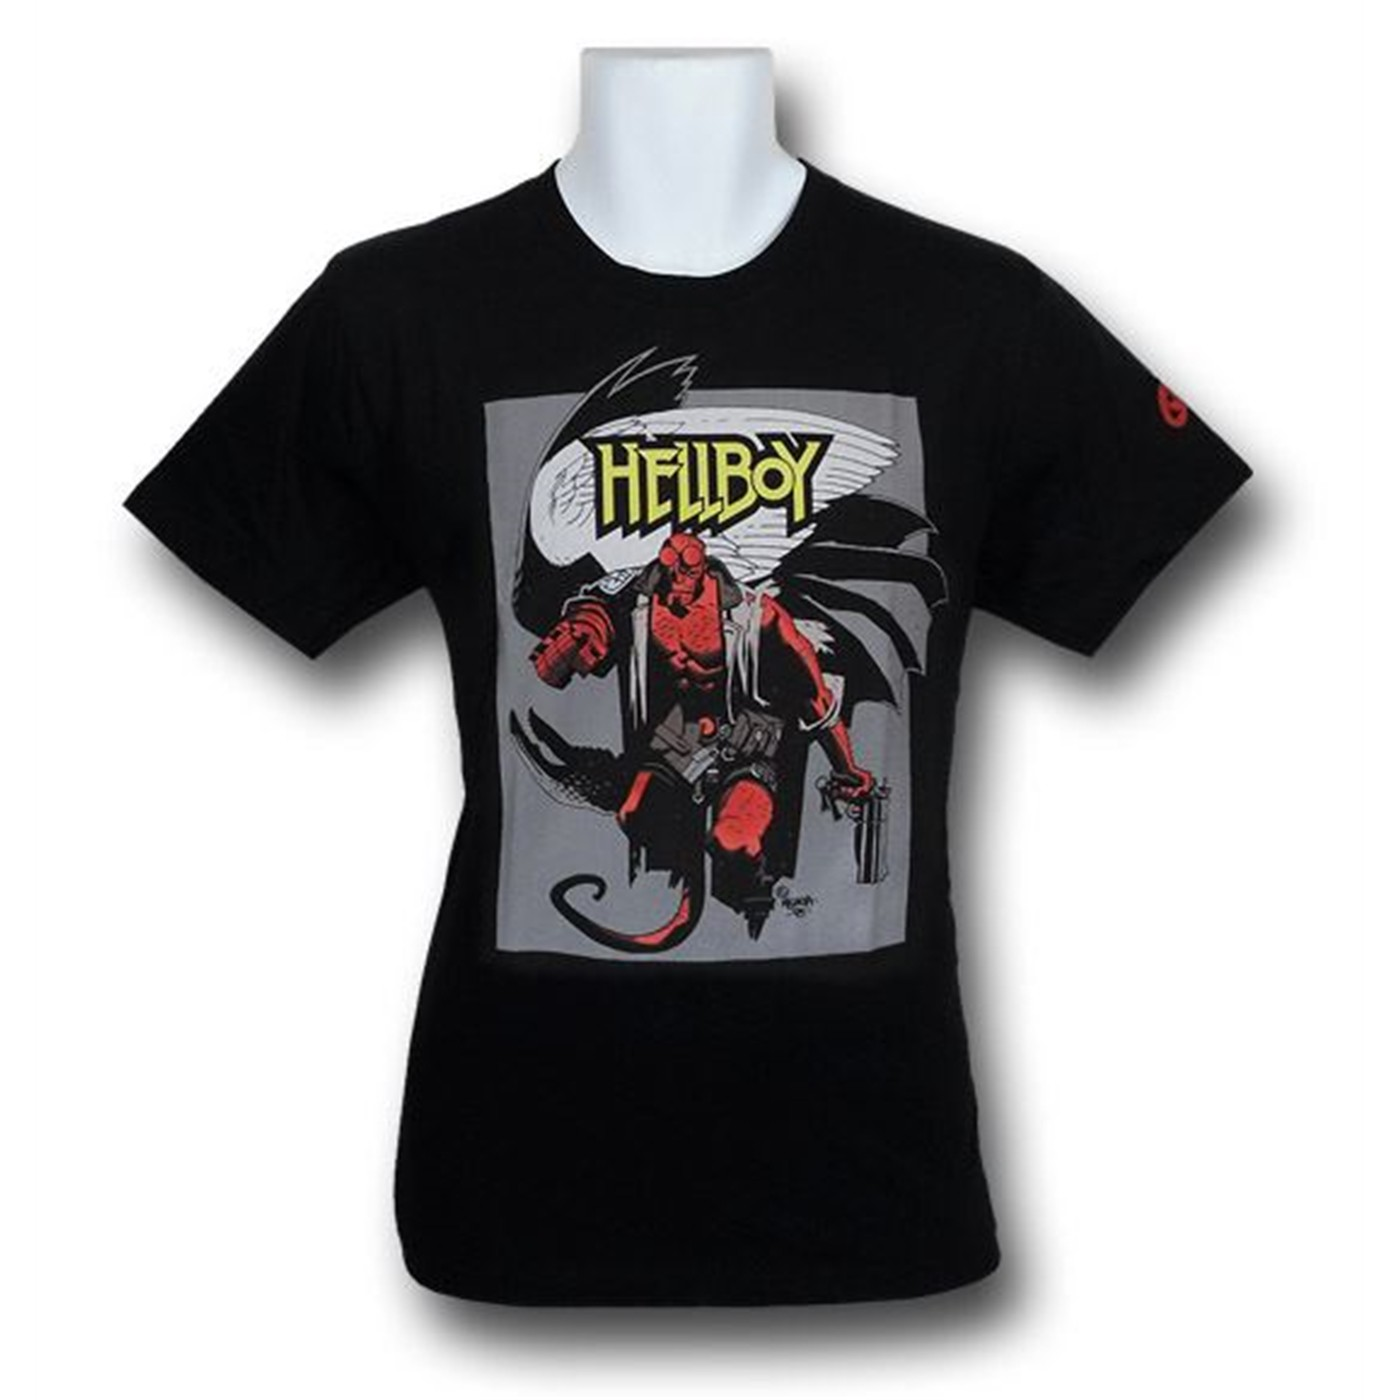 Hellboy T-Shirt By Mike Mignola T-Shirt